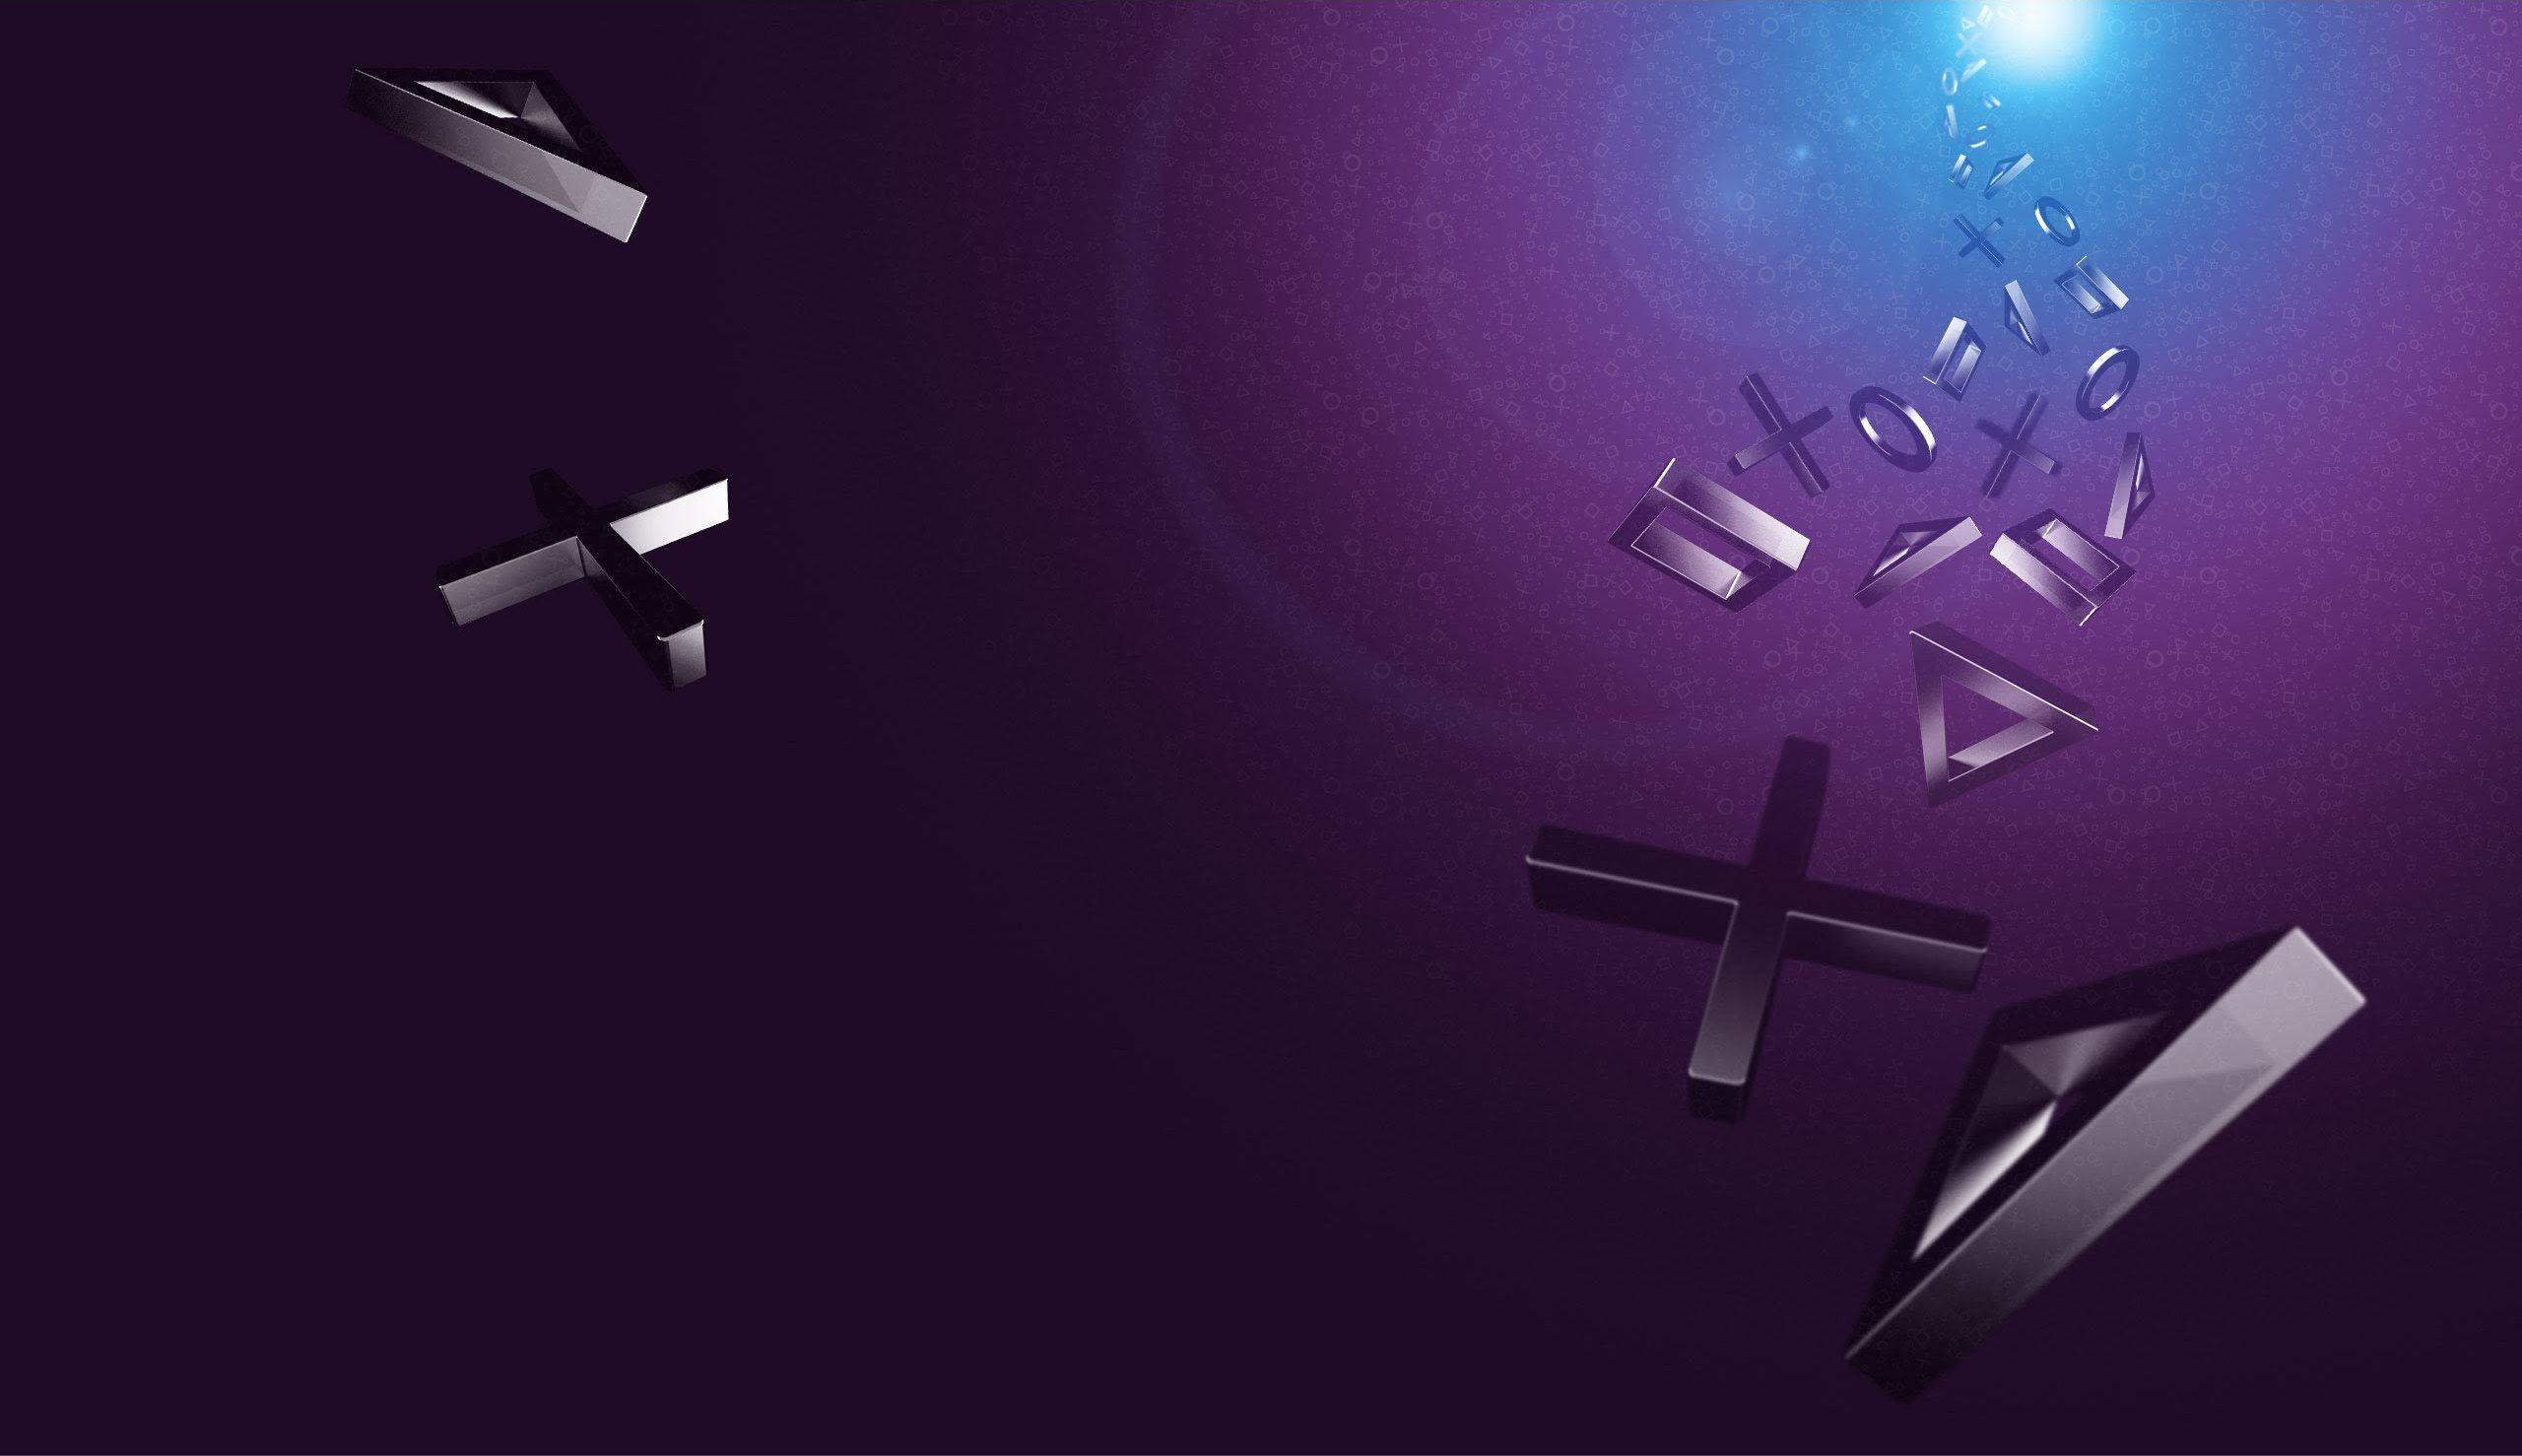 PlayStation Logos Wallpaper Marble iphone wallpaper